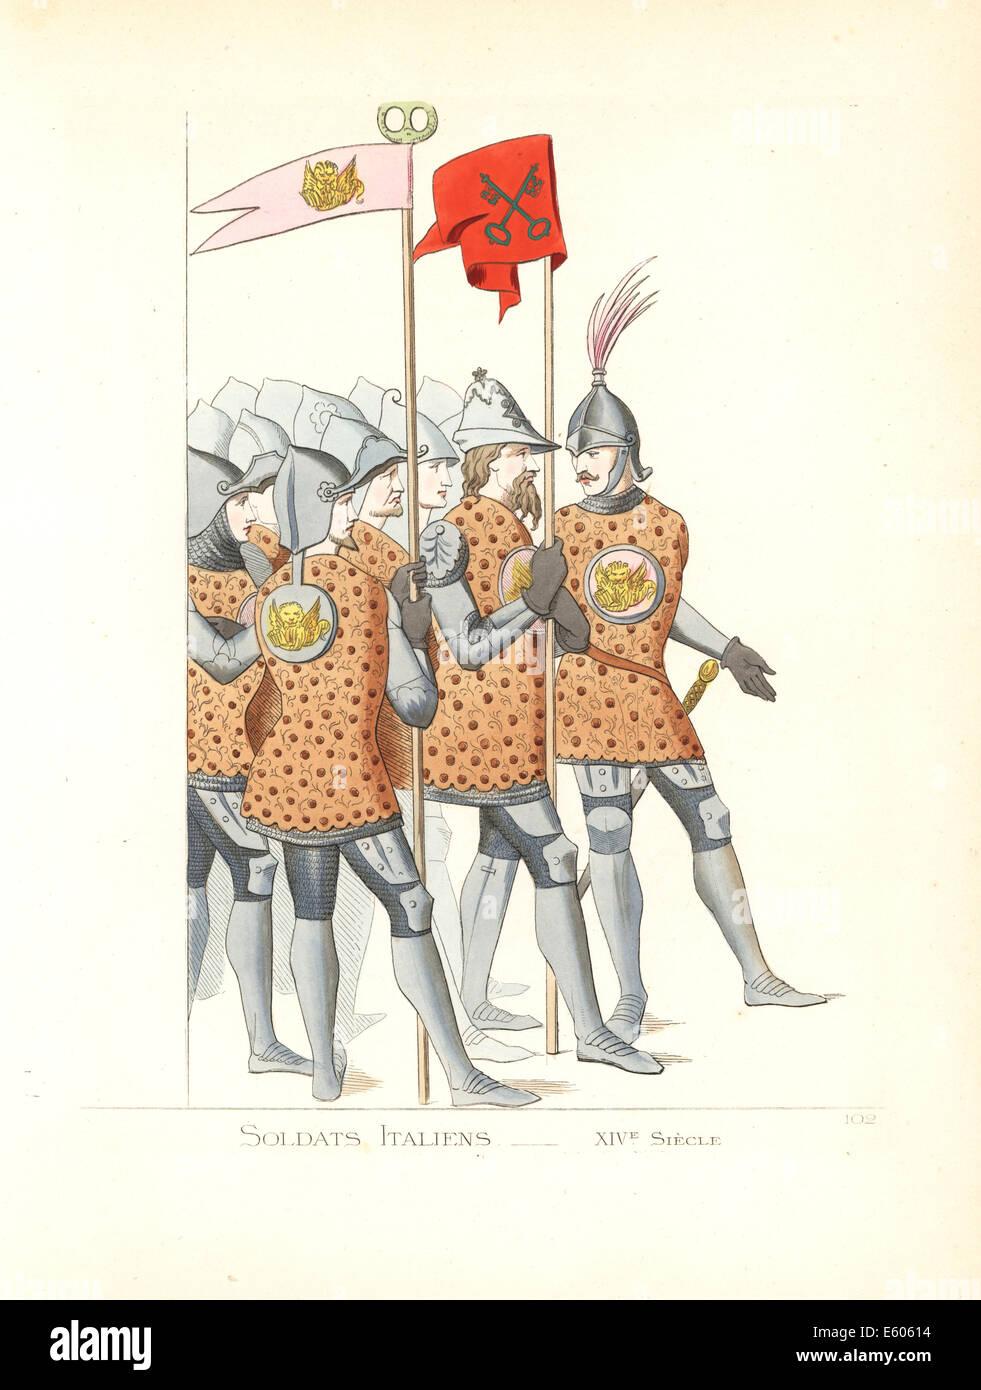 Uniforms of Italian soldiers, 14th century. - Stock Image